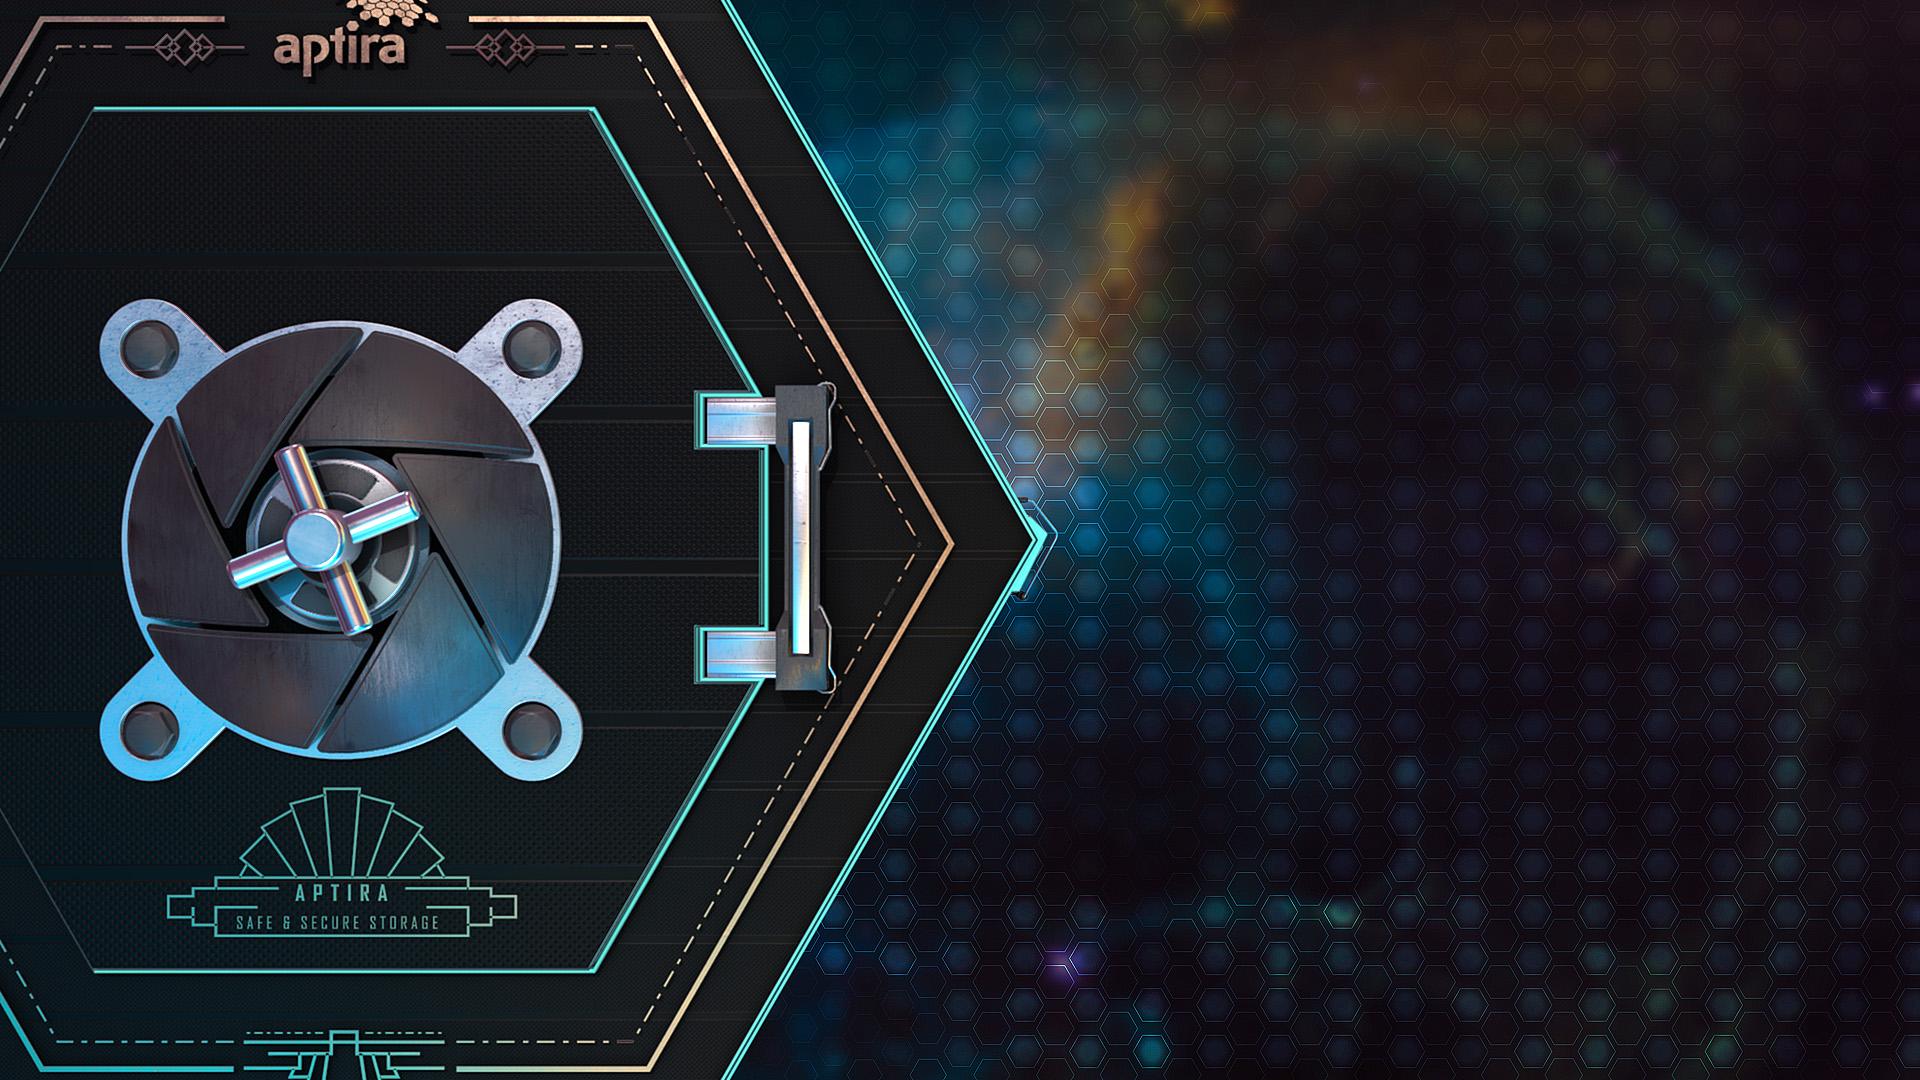 Software Defined Storage: Open & Enterprise Storage Solutions